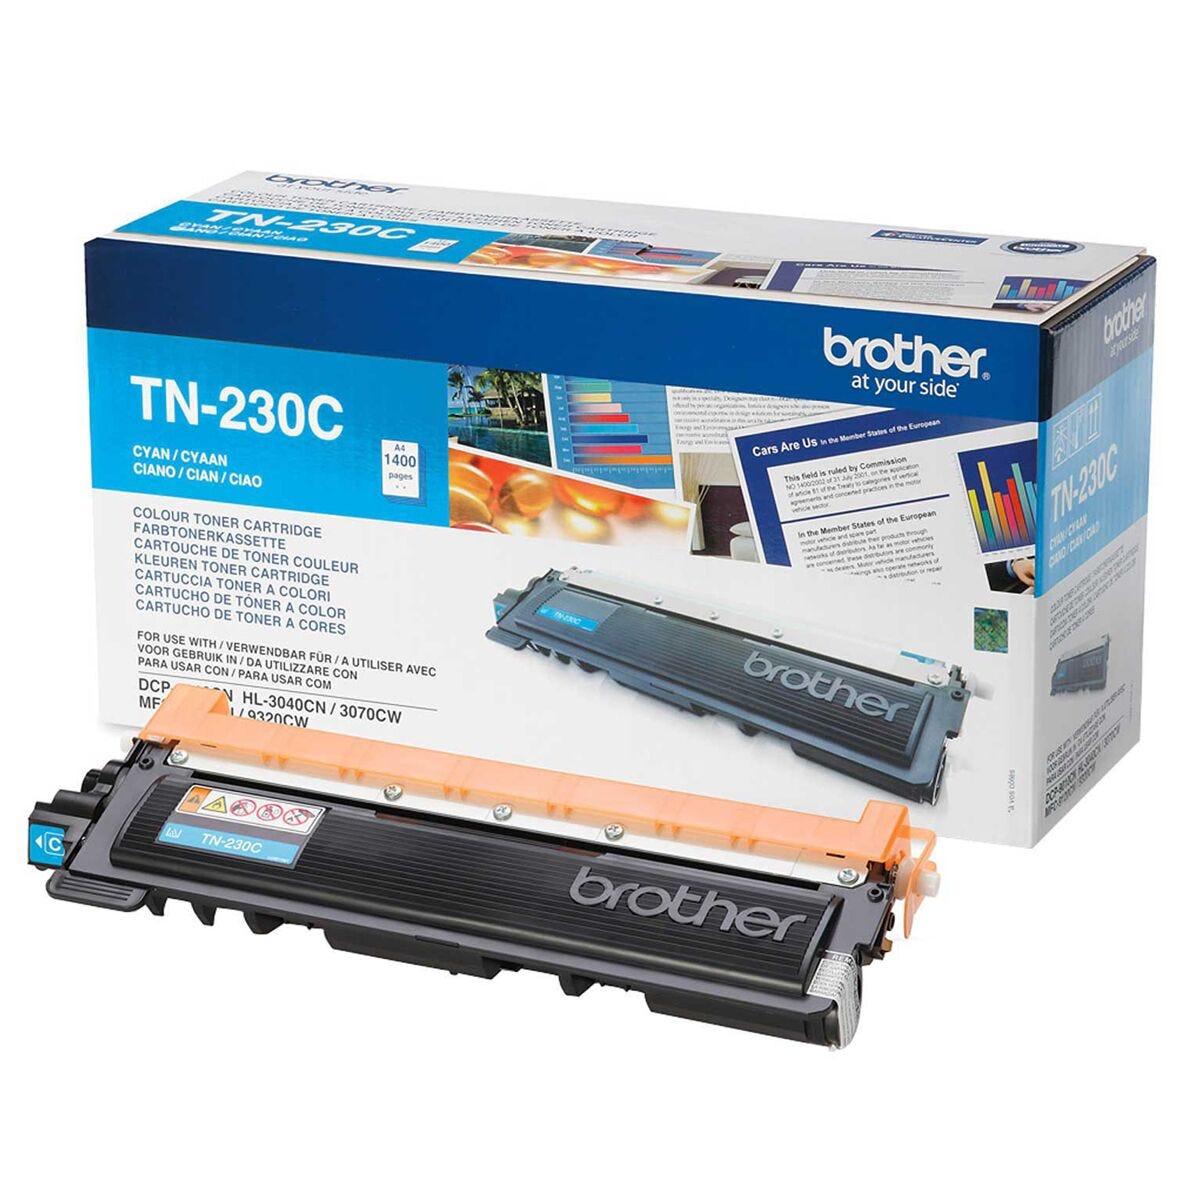 Brother TN 230 Printer Ink Toner Cartridge